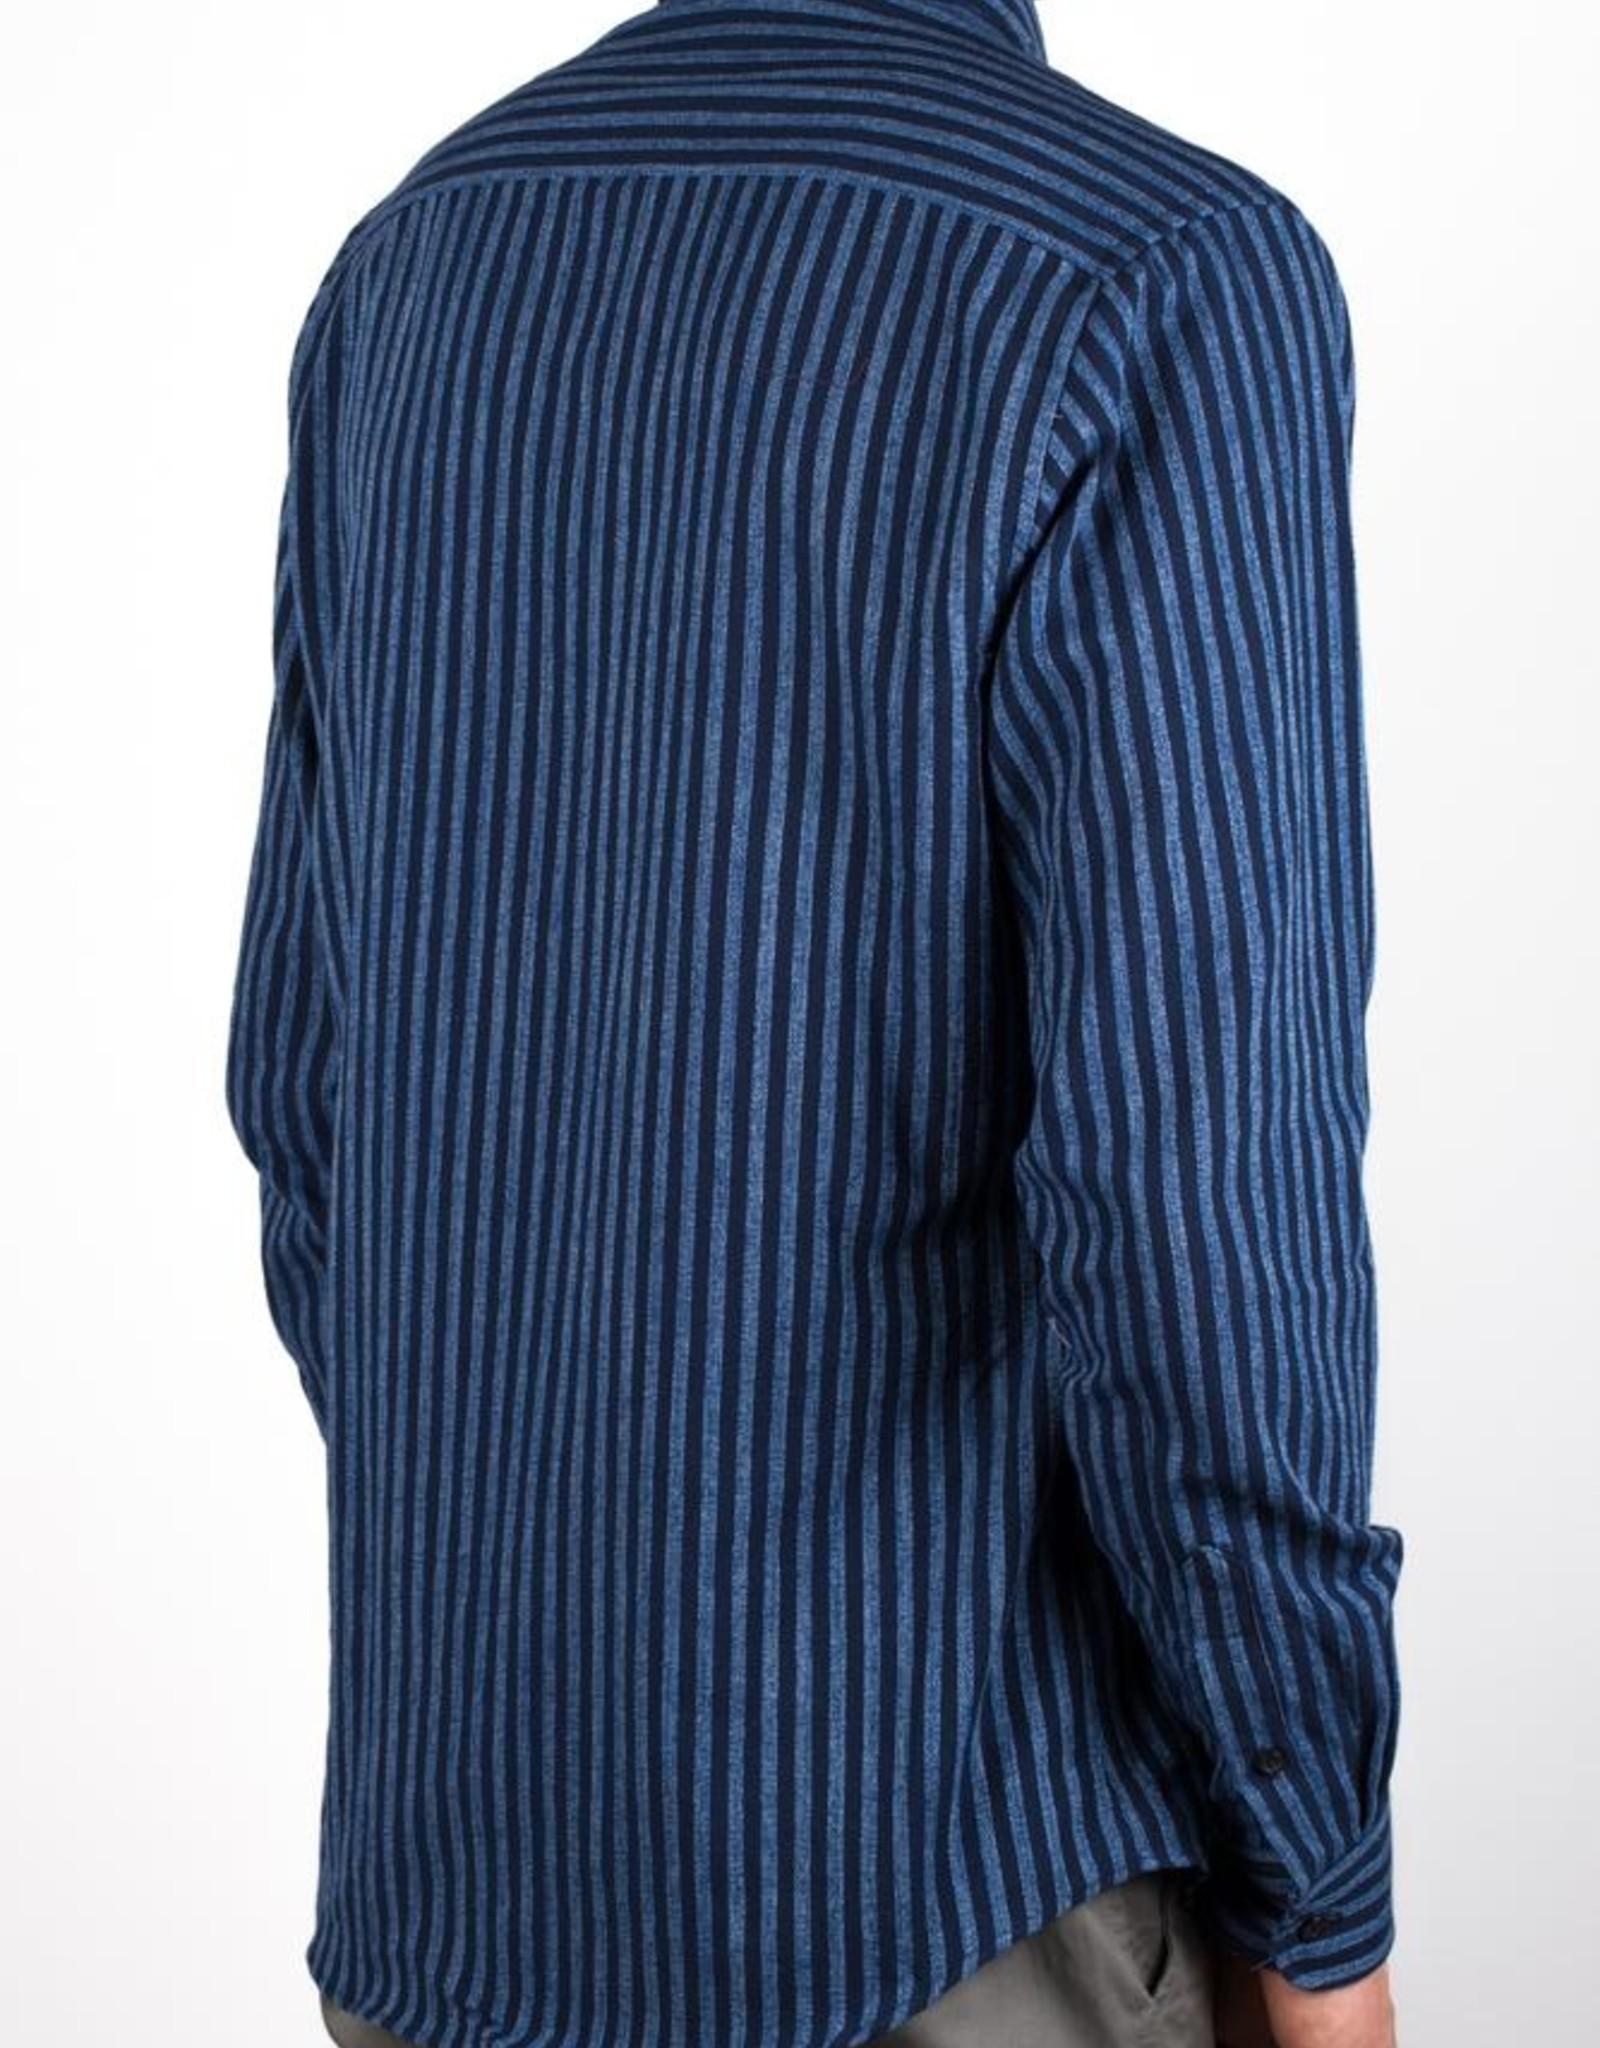 Bon Vivant - Gino Dobby Stripe - Navy/Light Blue